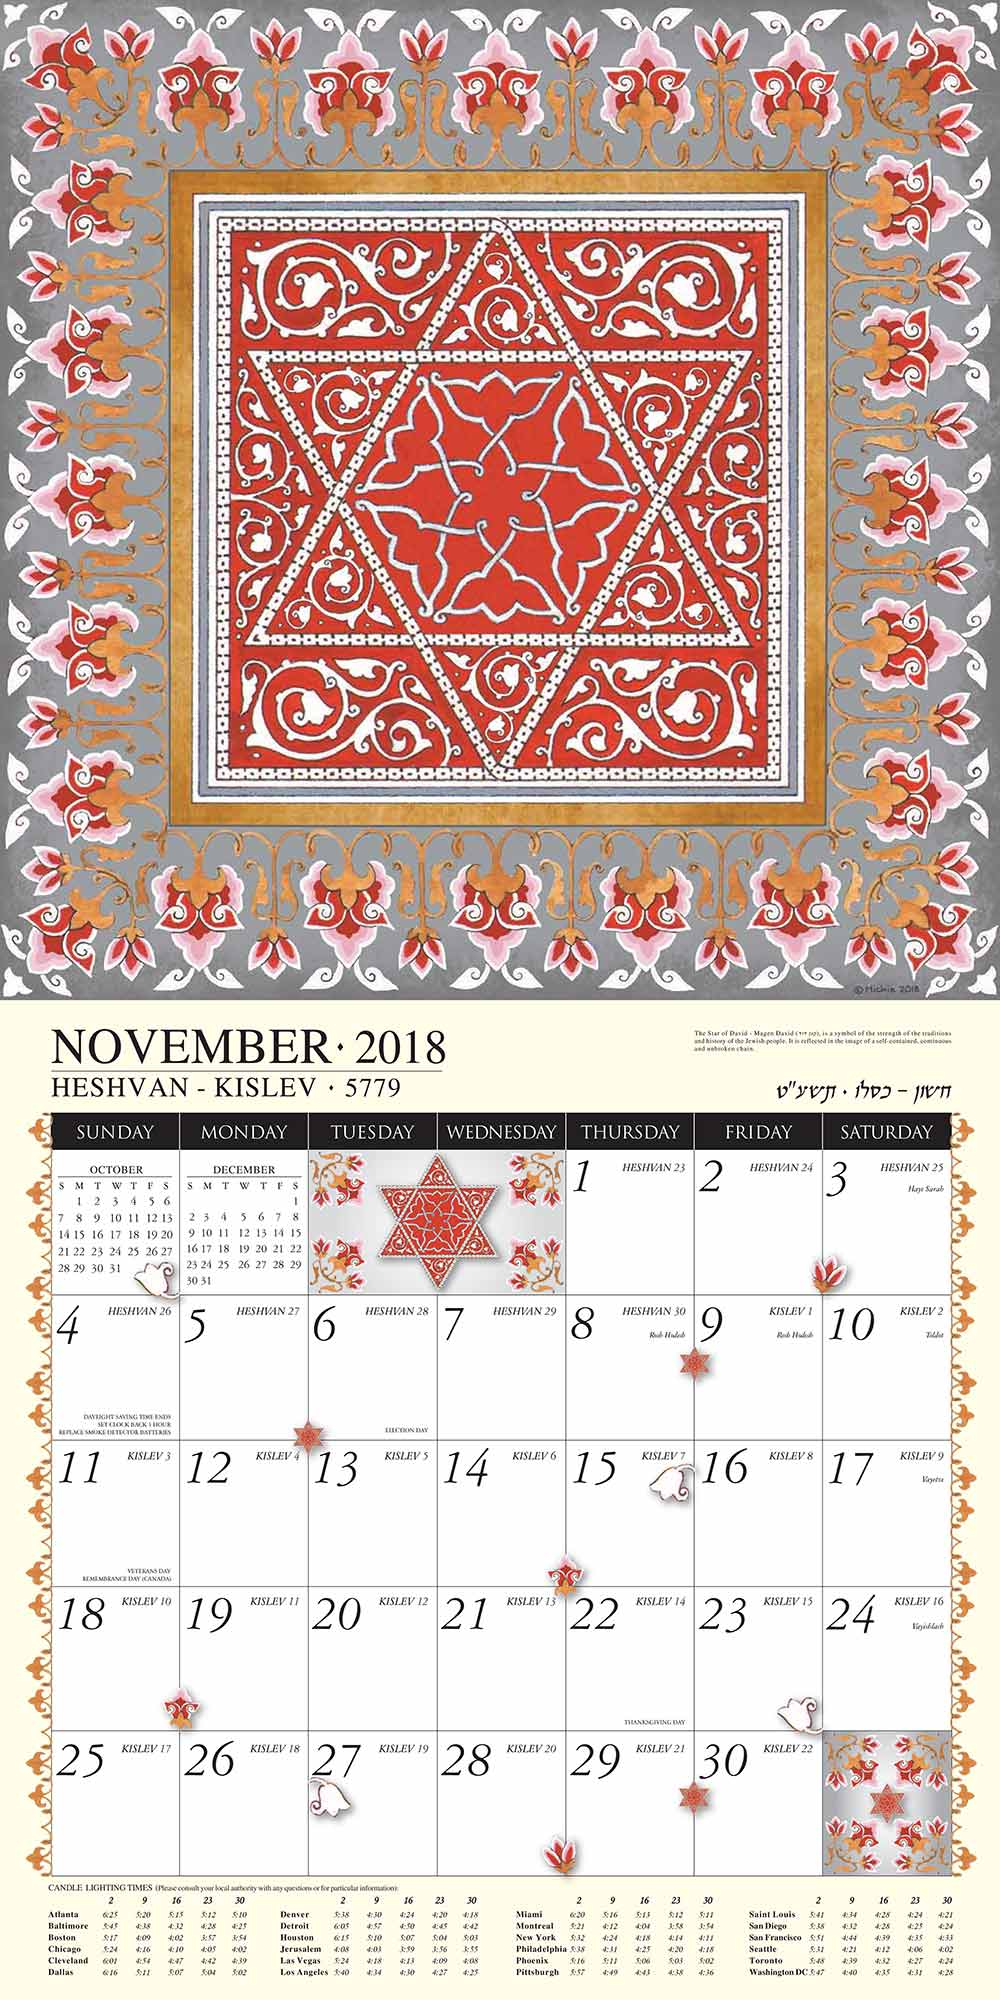 Jewish Art Calendar 2019 by Mickie Caspi November